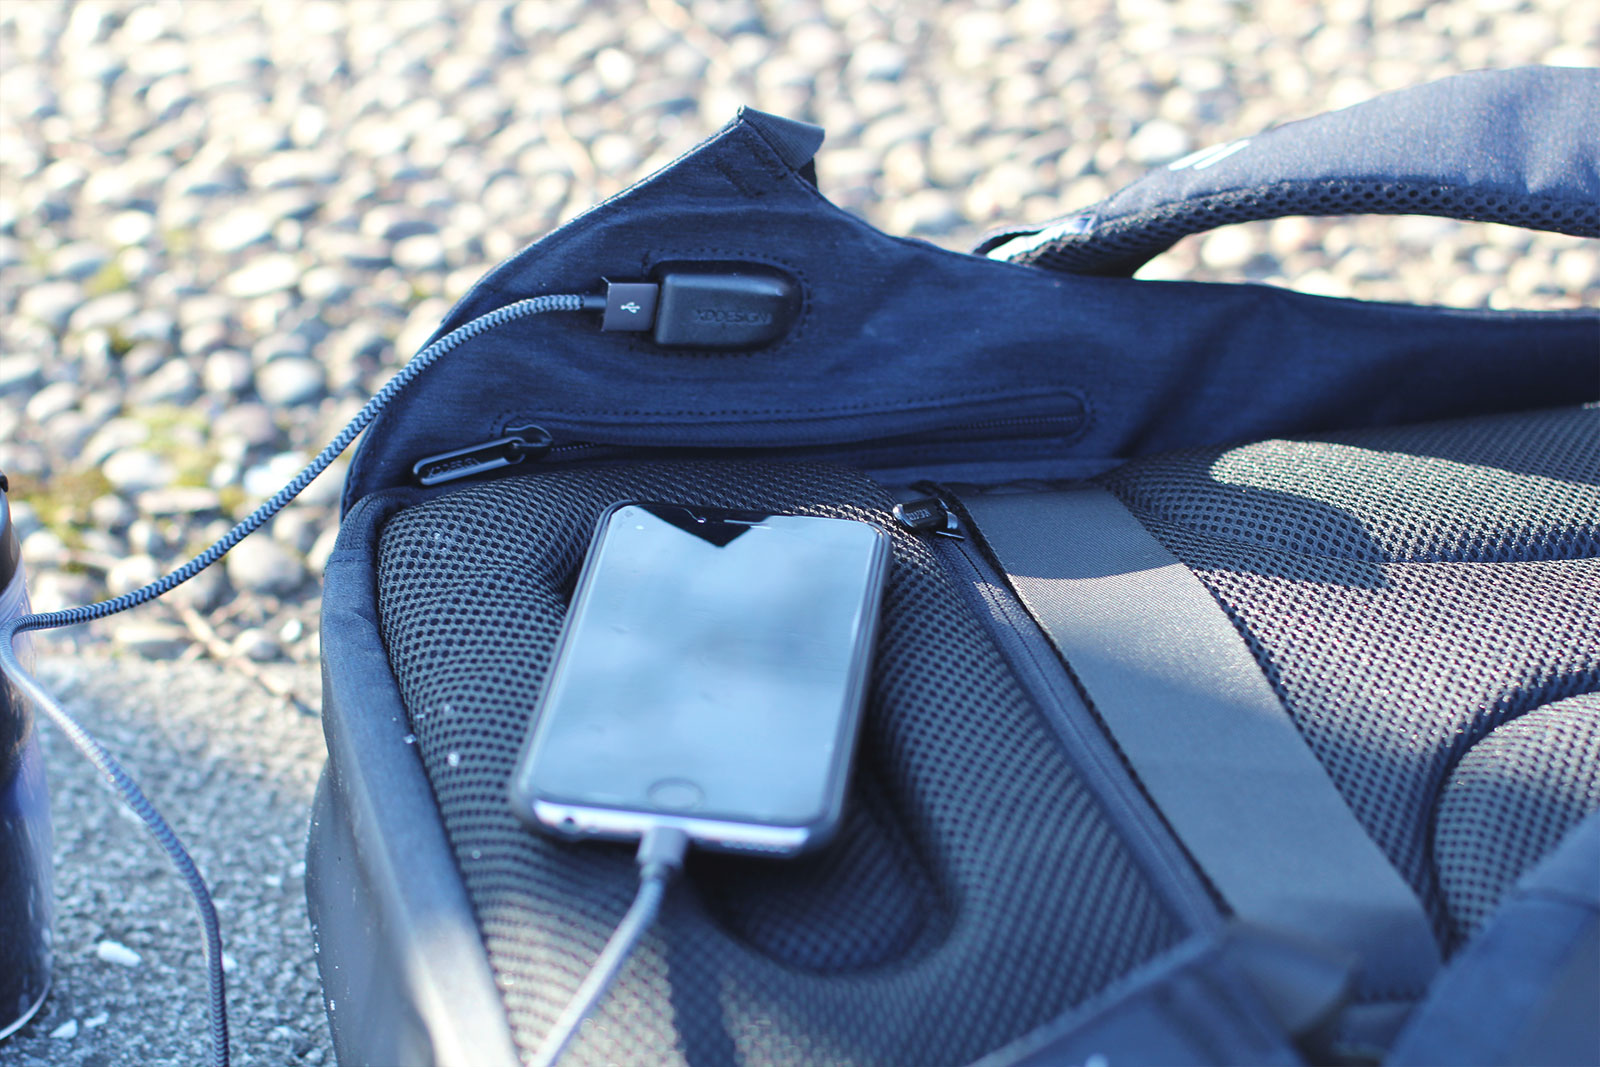 Sac recharge USB